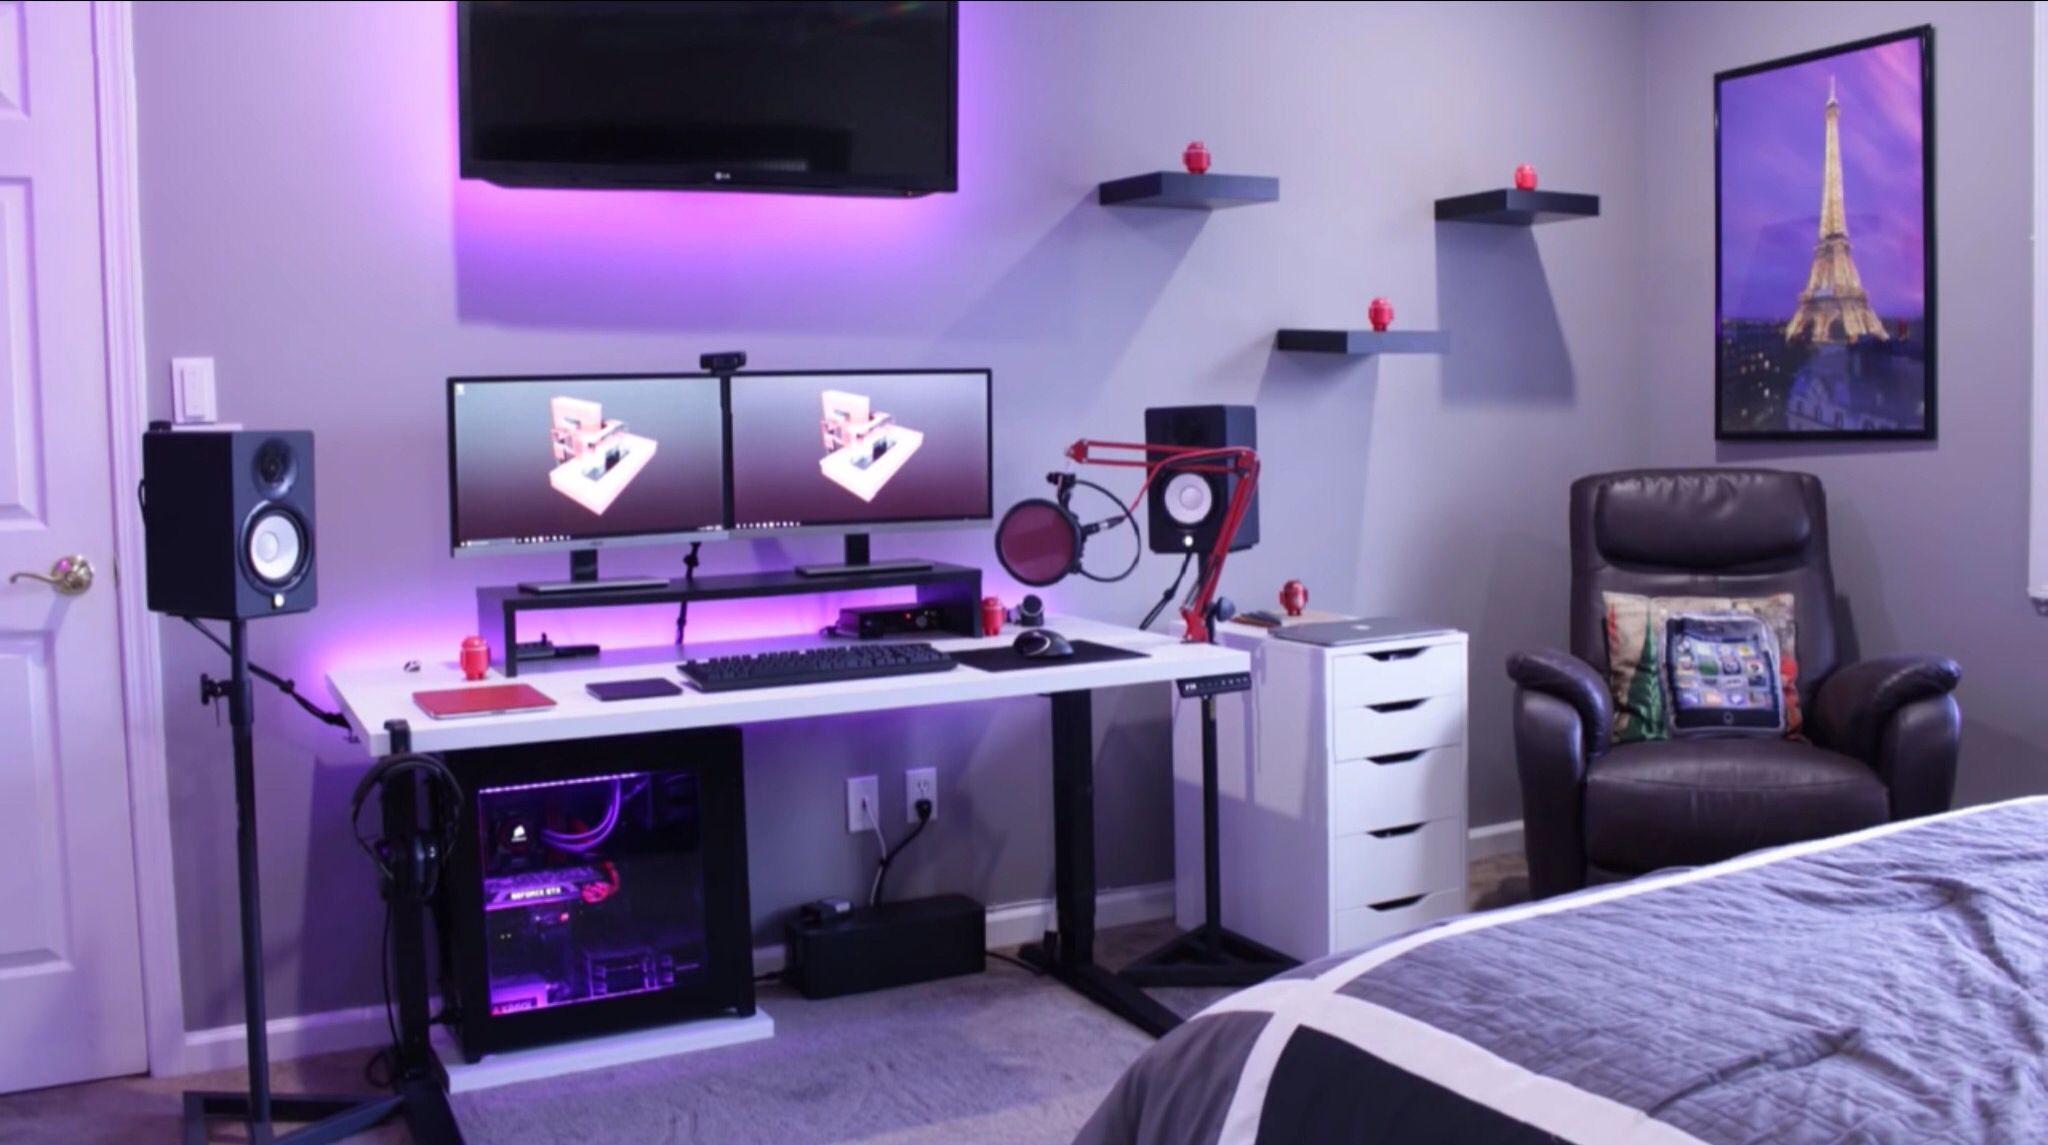 Home Office Dual Desk Setup: Setup Inspiration - DIY Computer Desk